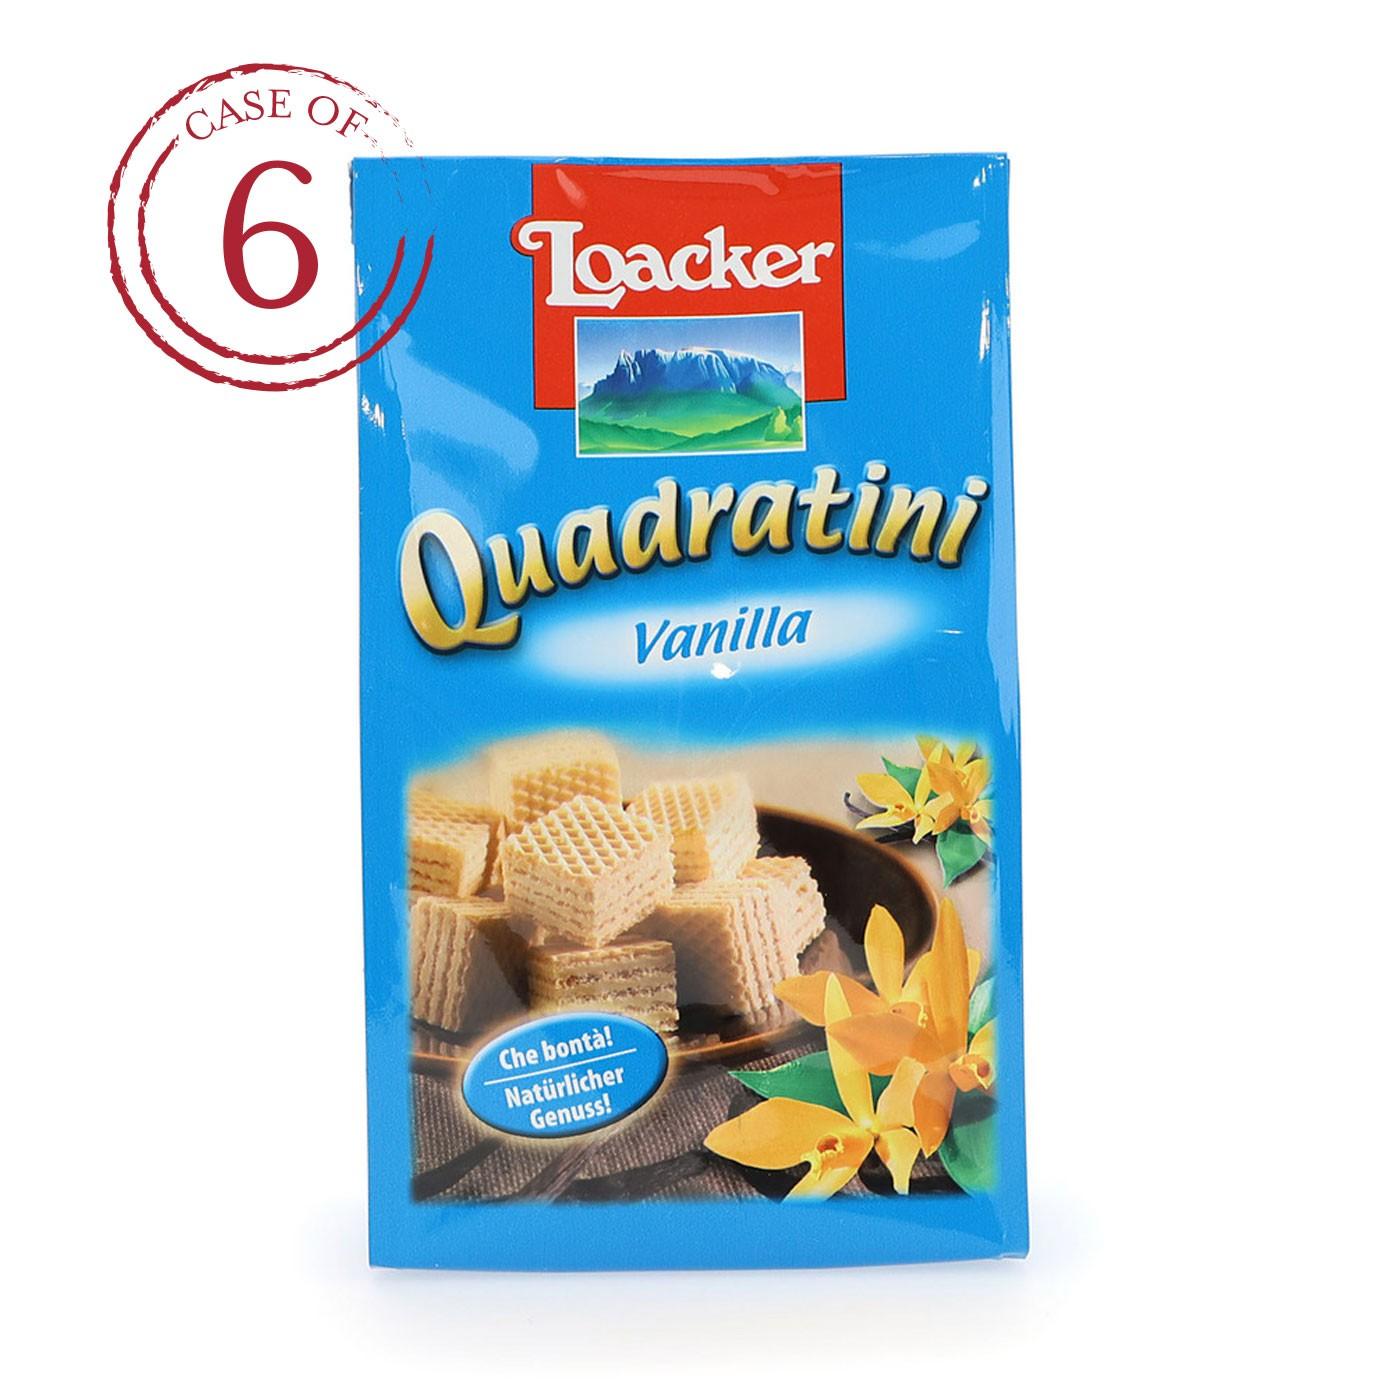 Vanilla Quadratini 4.4 oz - Case of 6